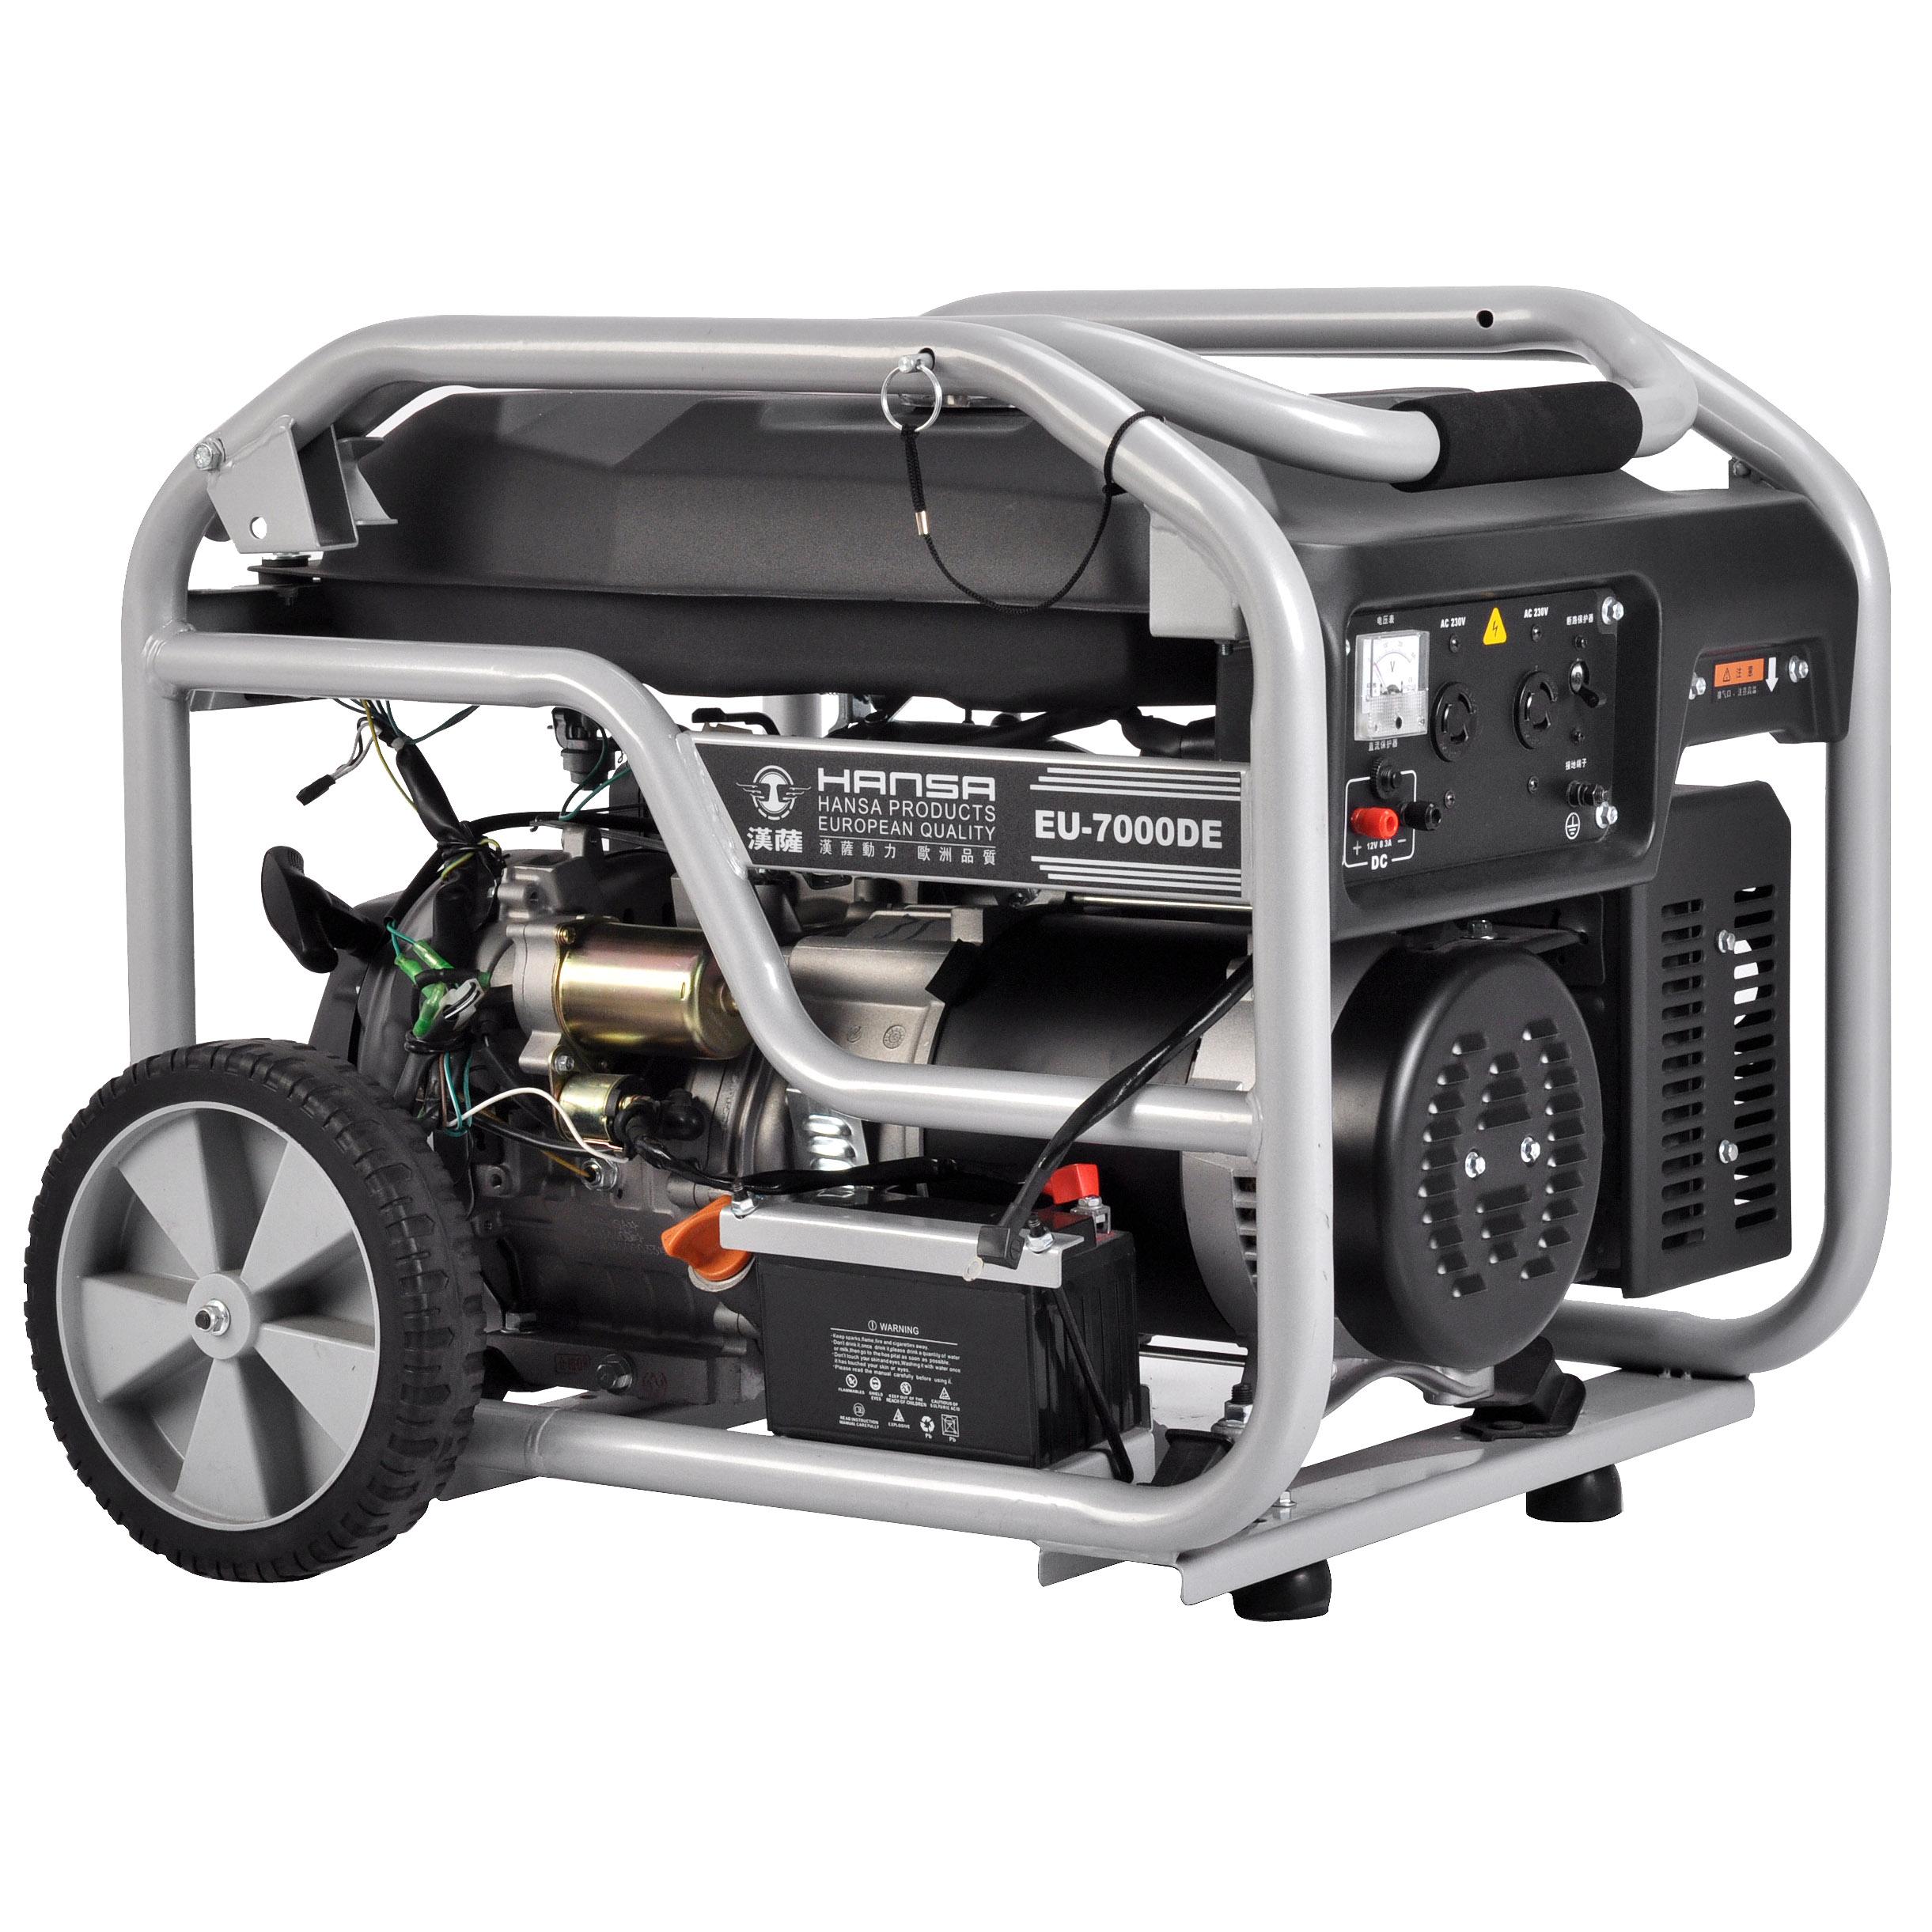 6KW单相电启动汽油发电机——EU-7000DE